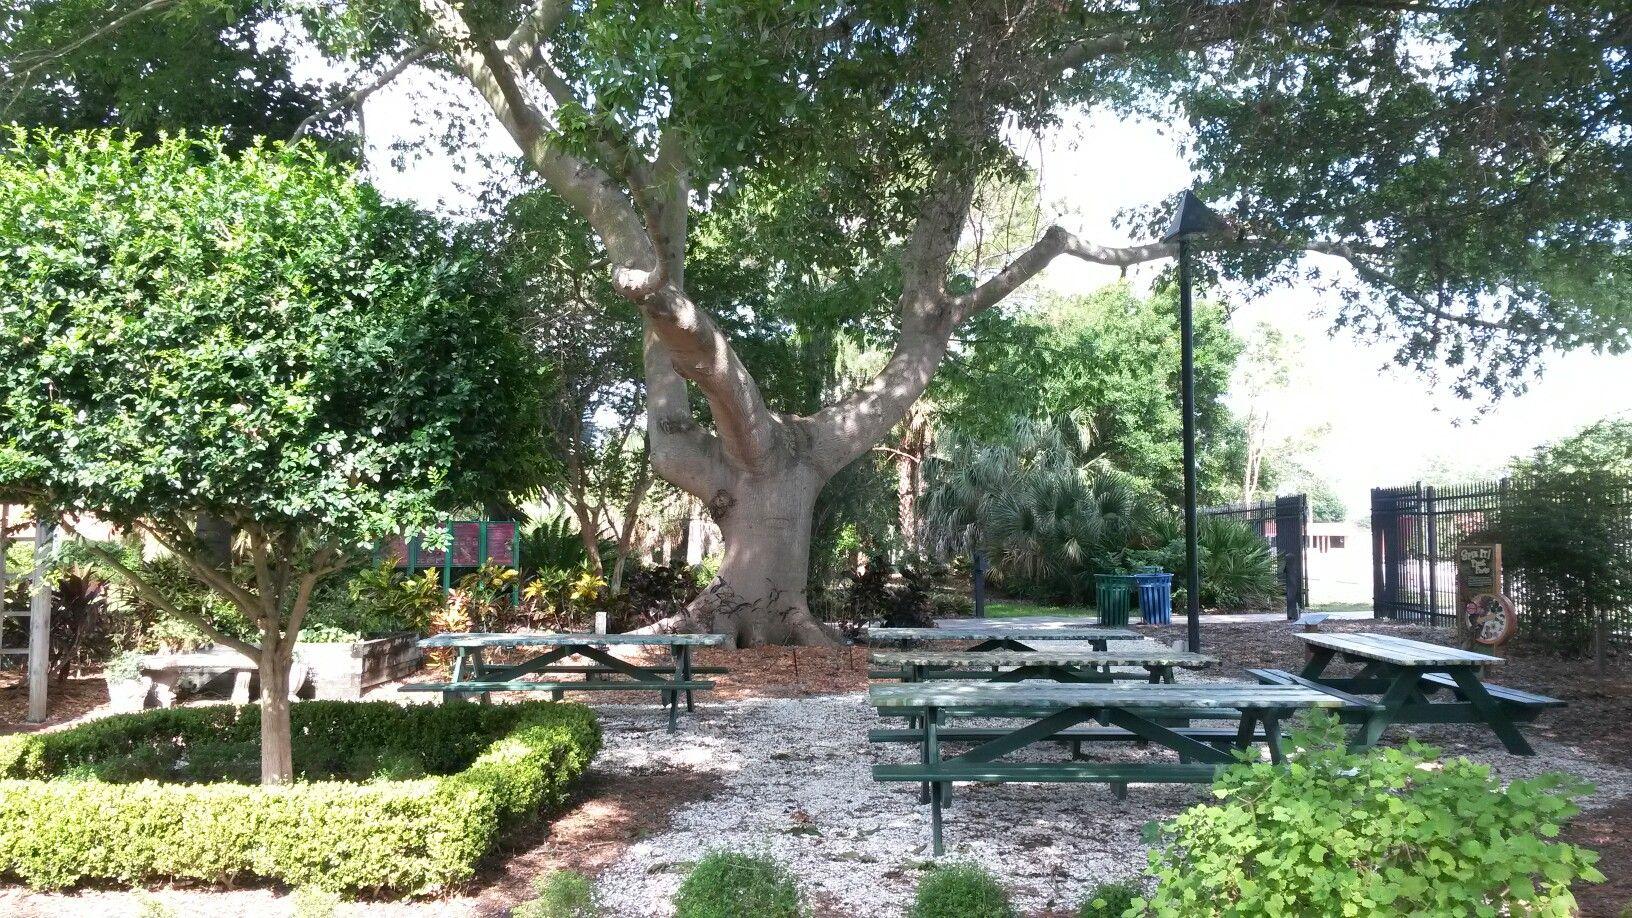 73c9f0dcab3635bf063e20b3717001ed - The Florida Botanical Gardens In Largo